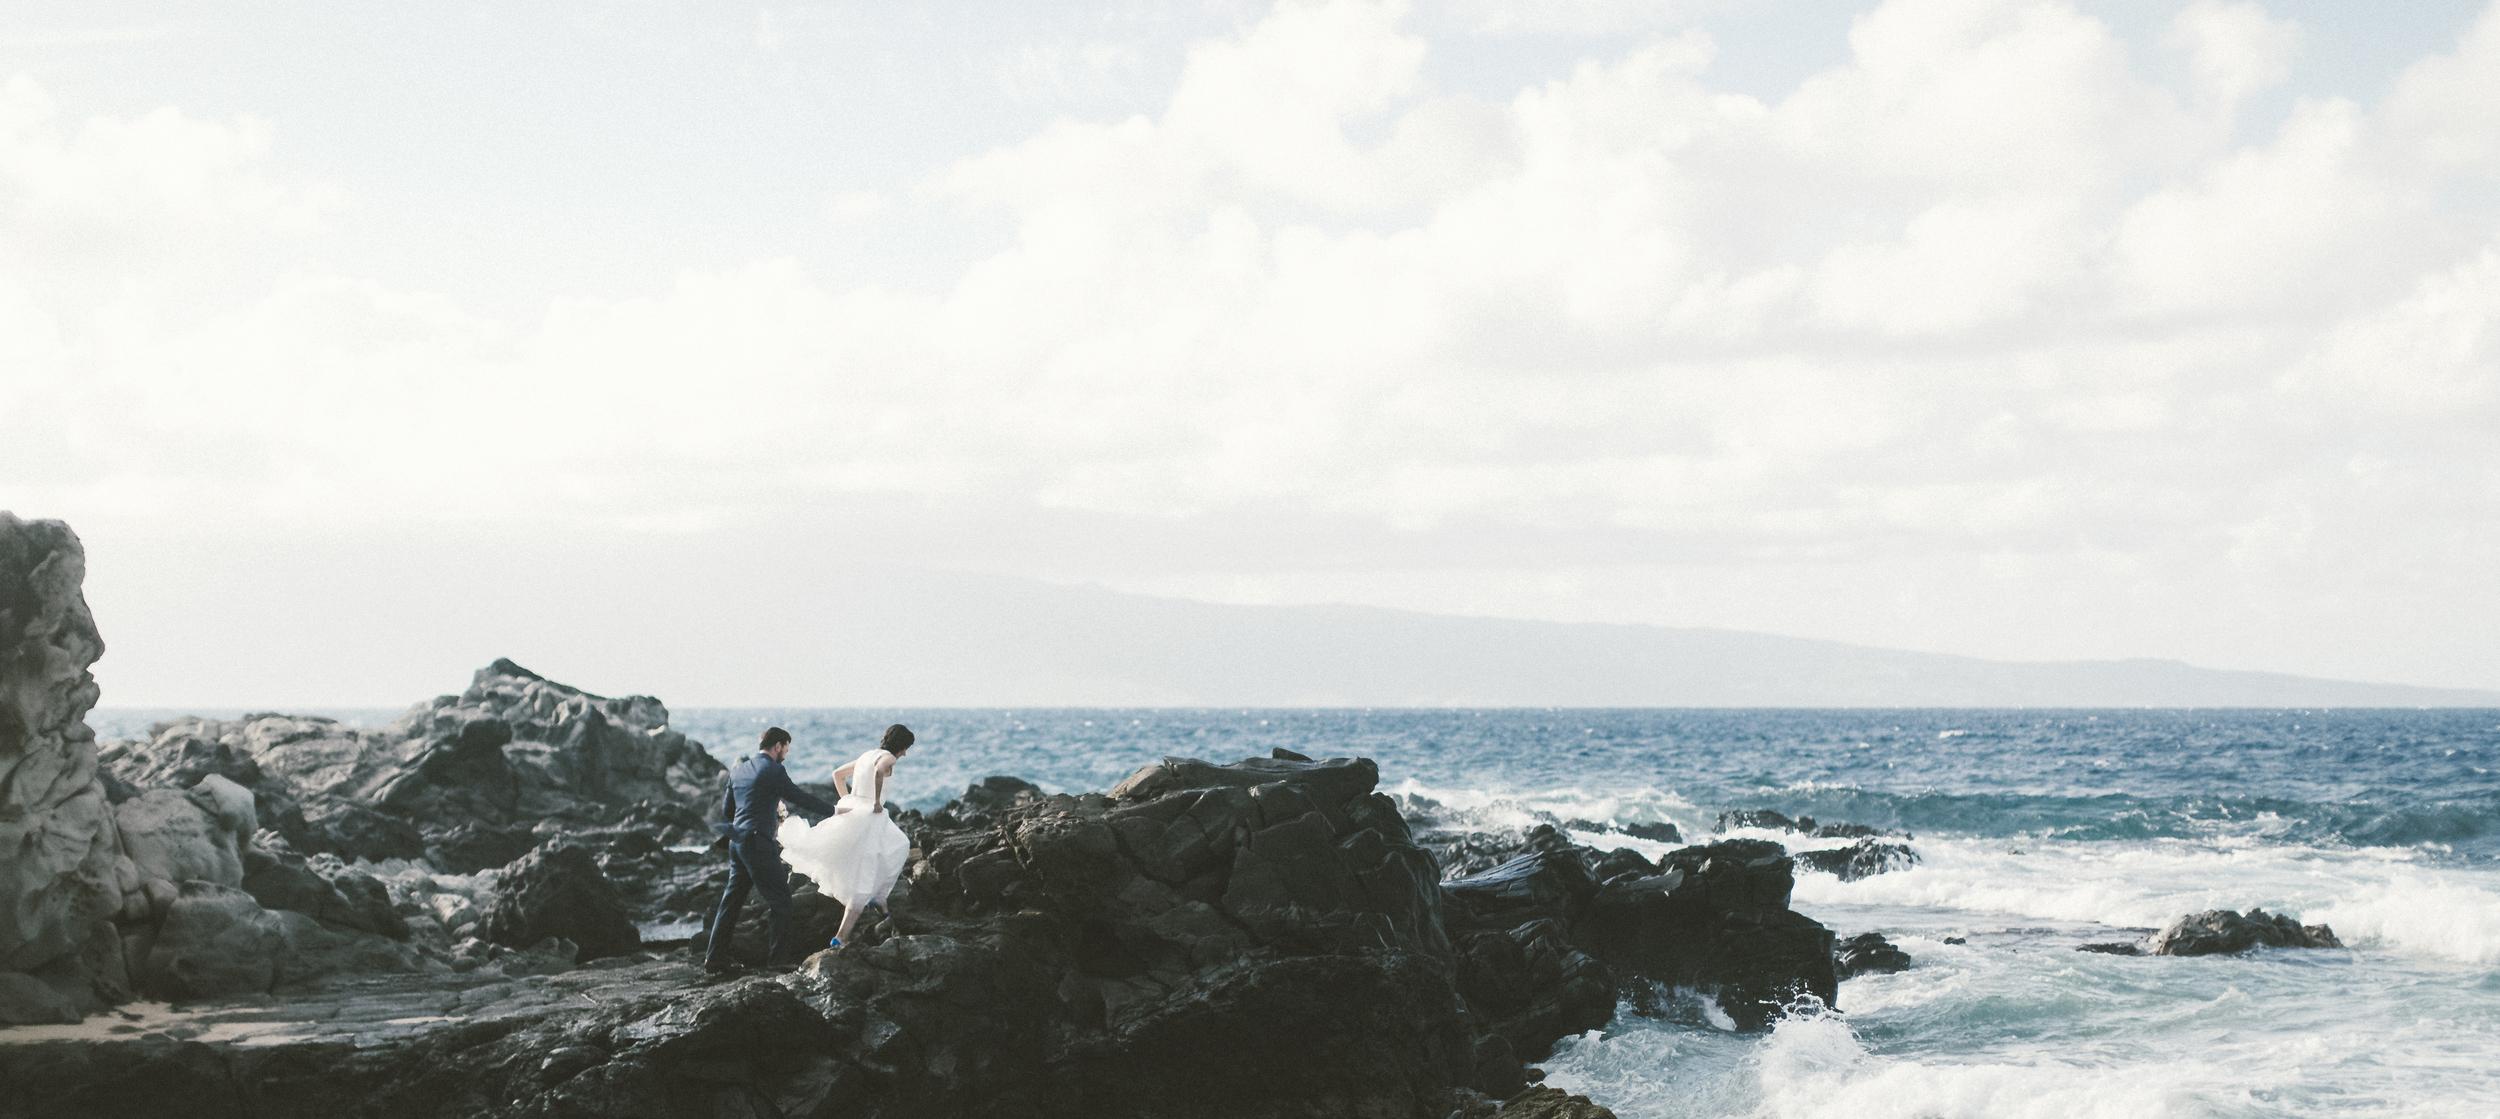 angie-diaz-photography-maui-wedding-ironwoods-beach-40.jpg